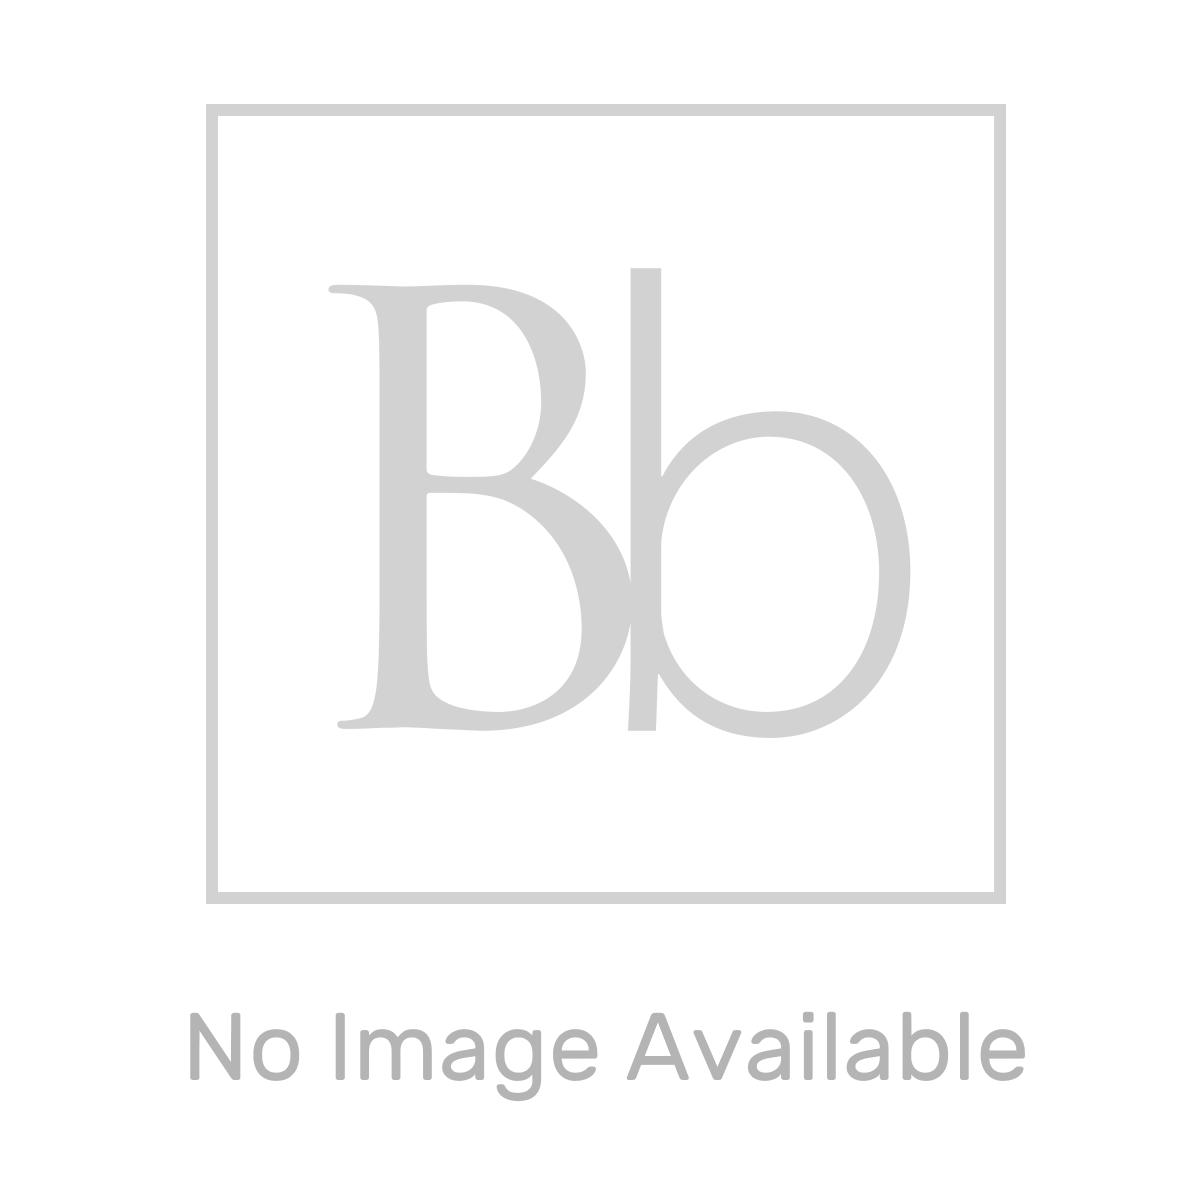 RAK Maremma Sand Matt Tile 600 x 600mm